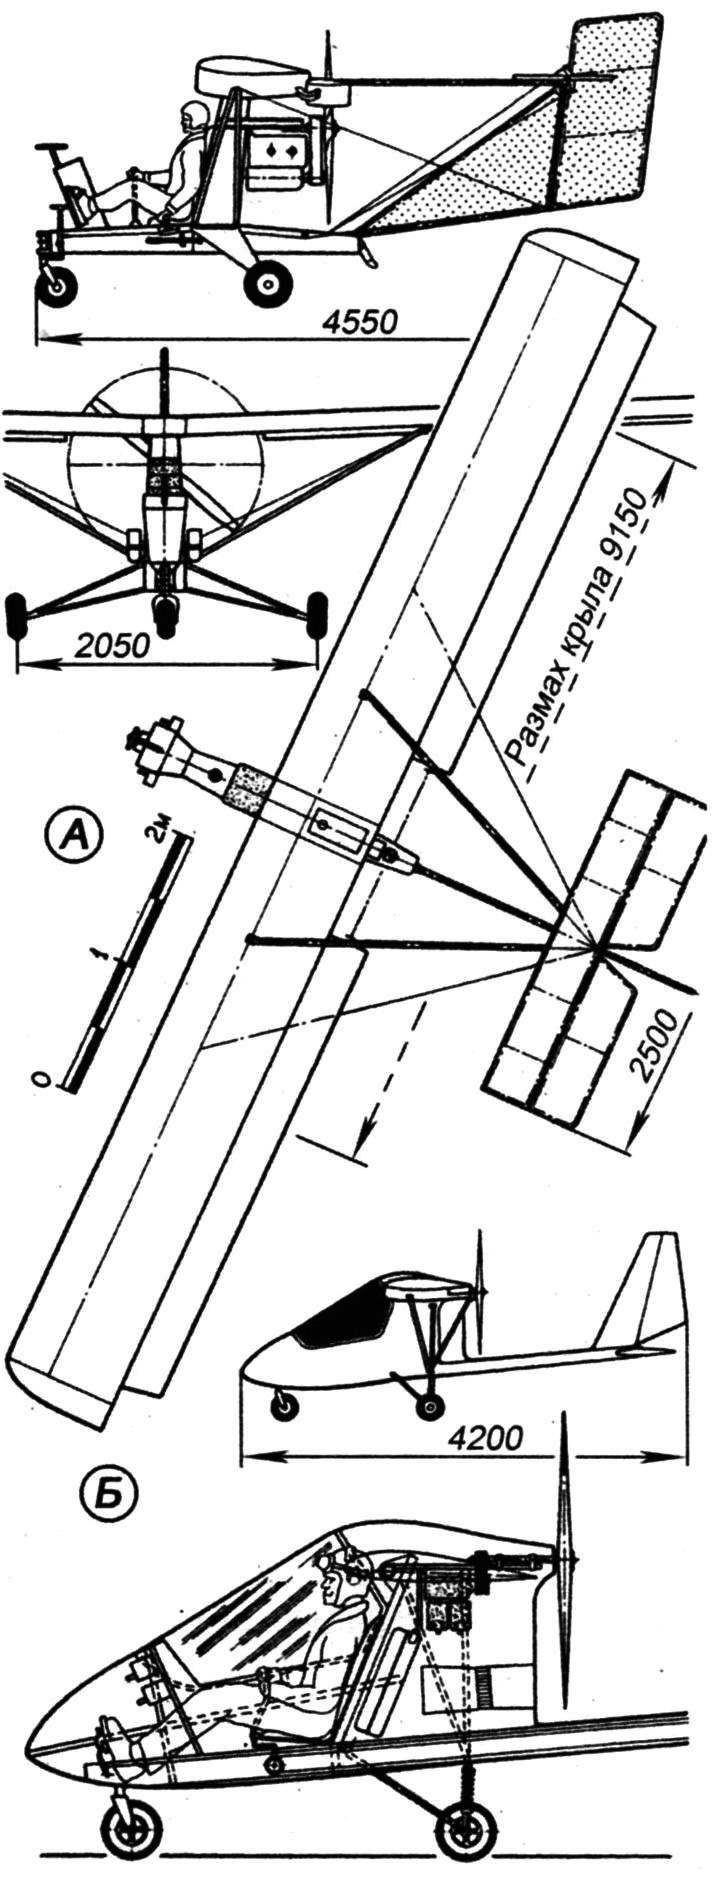 Single beam planes